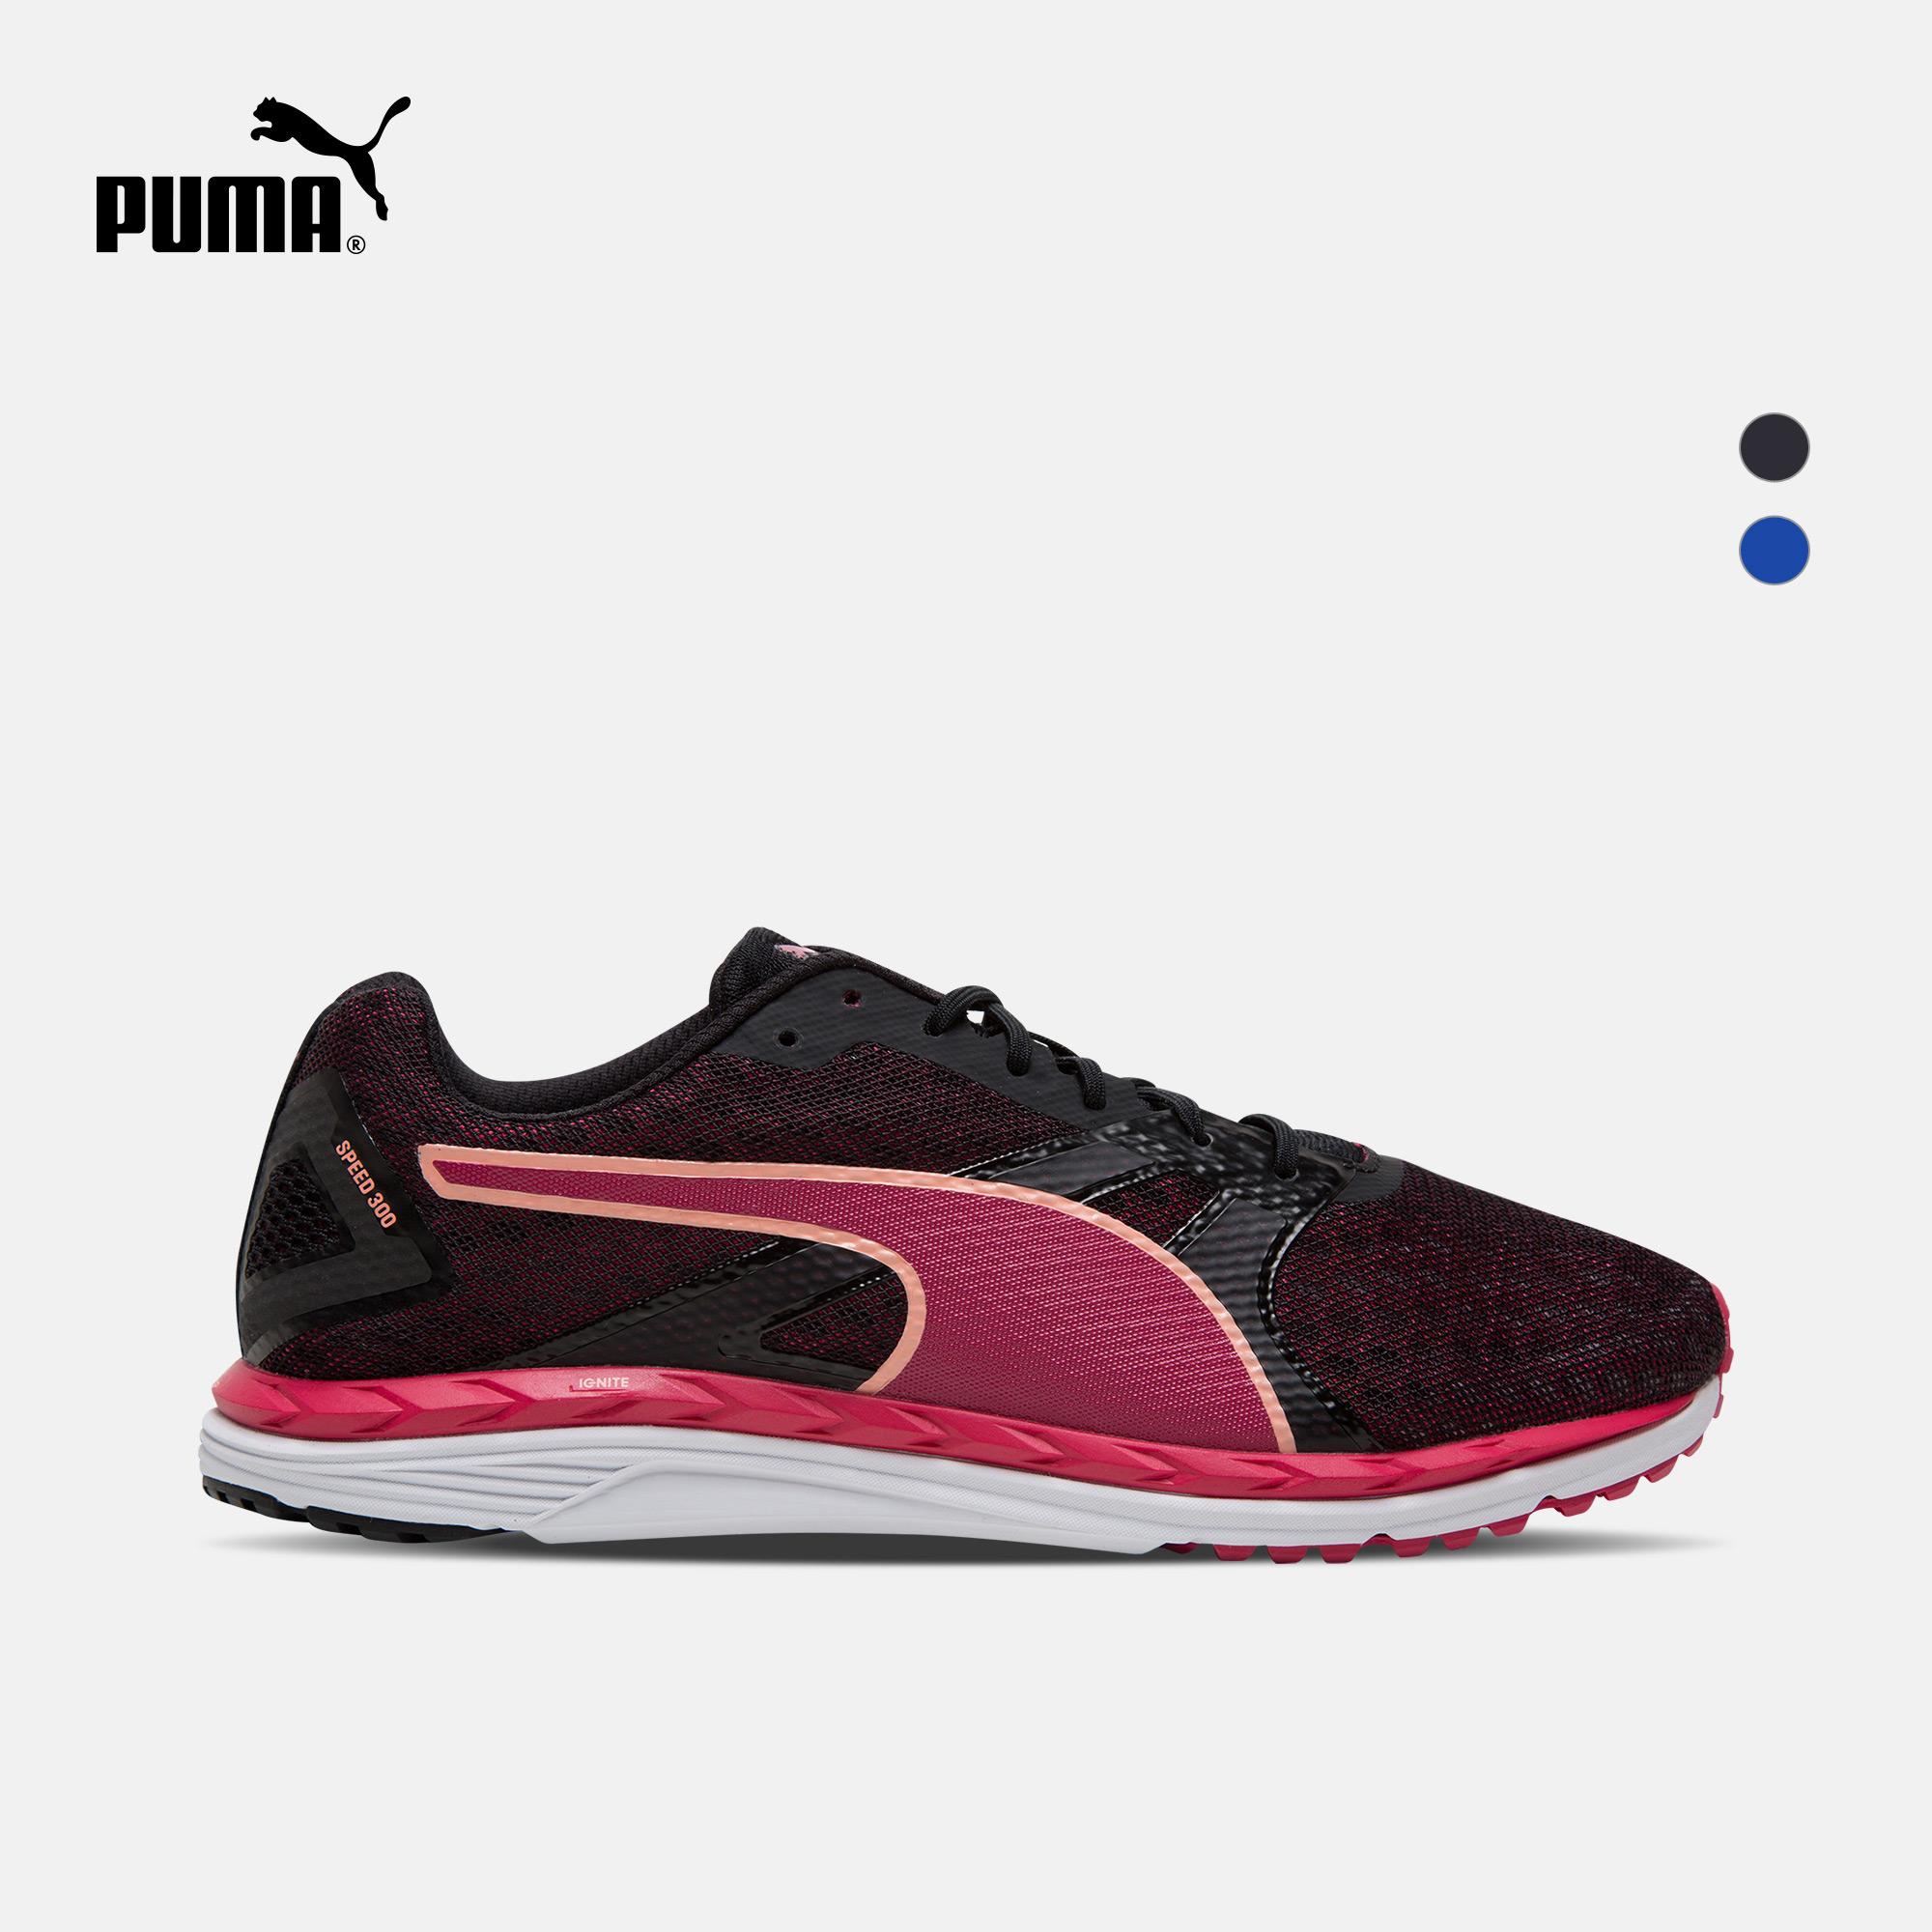 PUMA彪马官方 女子跑步鞋 Speed 300 IGNITE 2 189947